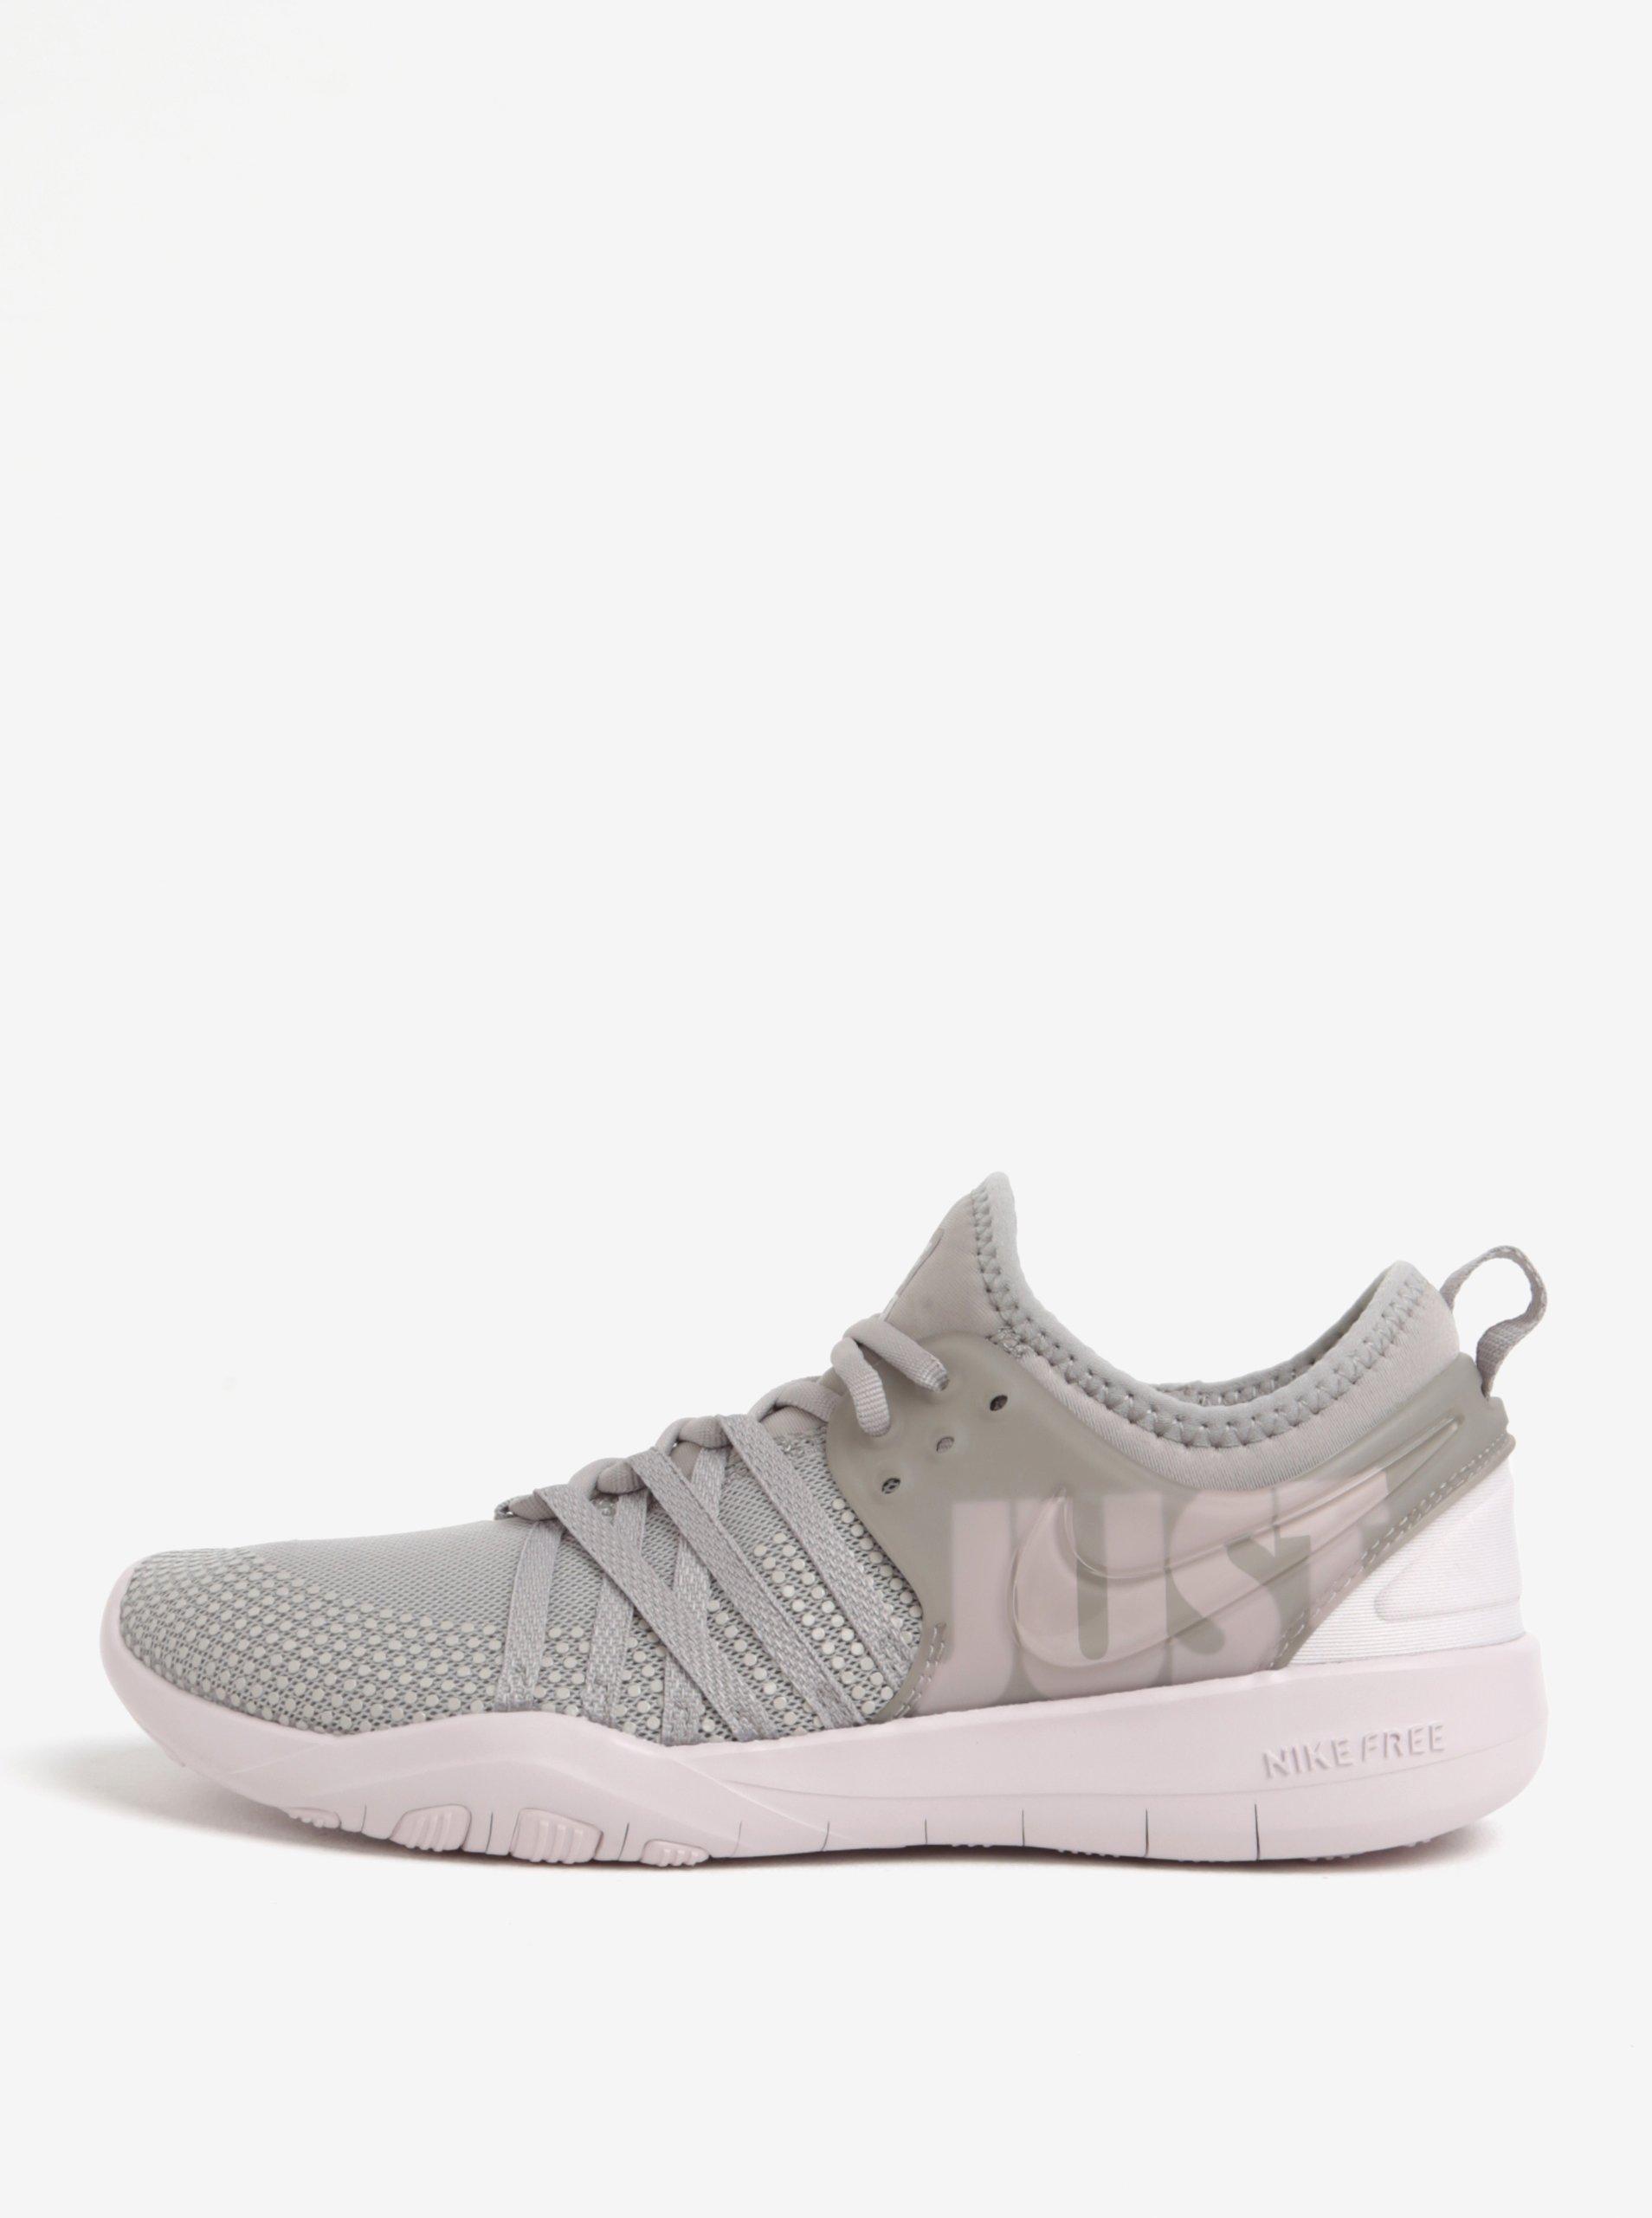 2297b6c55b4 Světle šedé dámské tenisky Nike Free TR 7 Premium Training